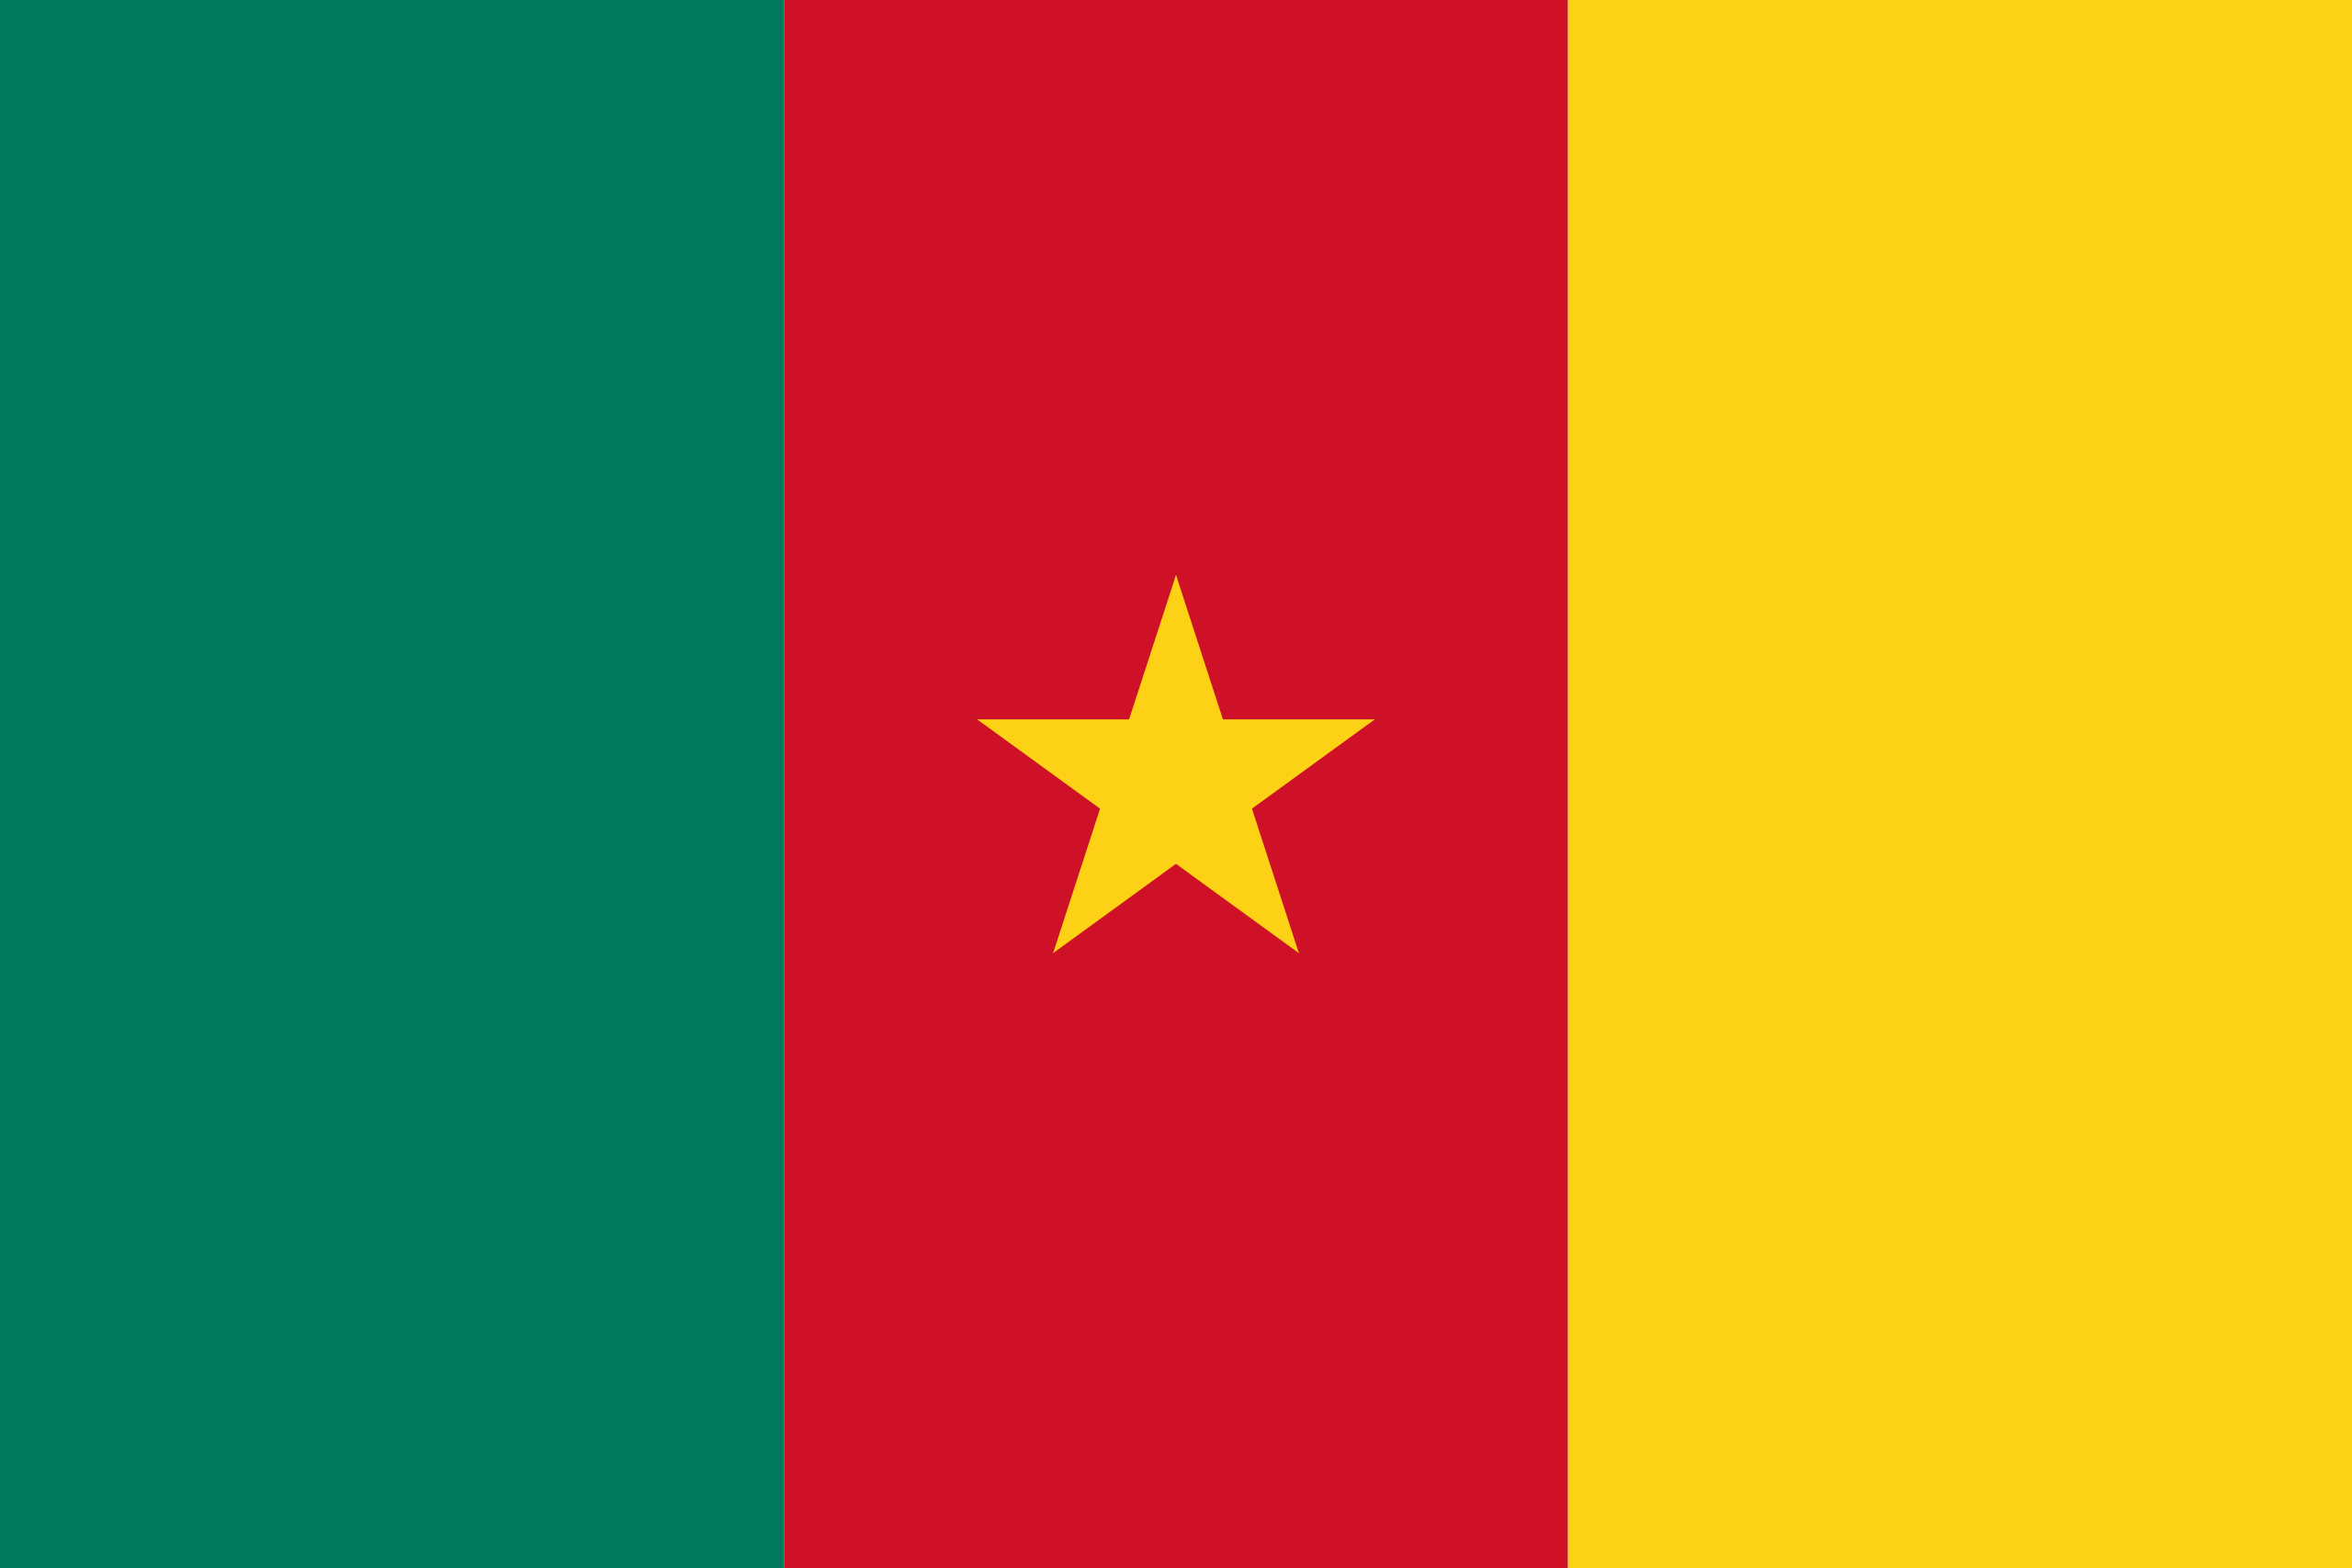 camerún, 国家, 会徽, 徽标, 符号 - 高清壁纸 - 教授-falken.com